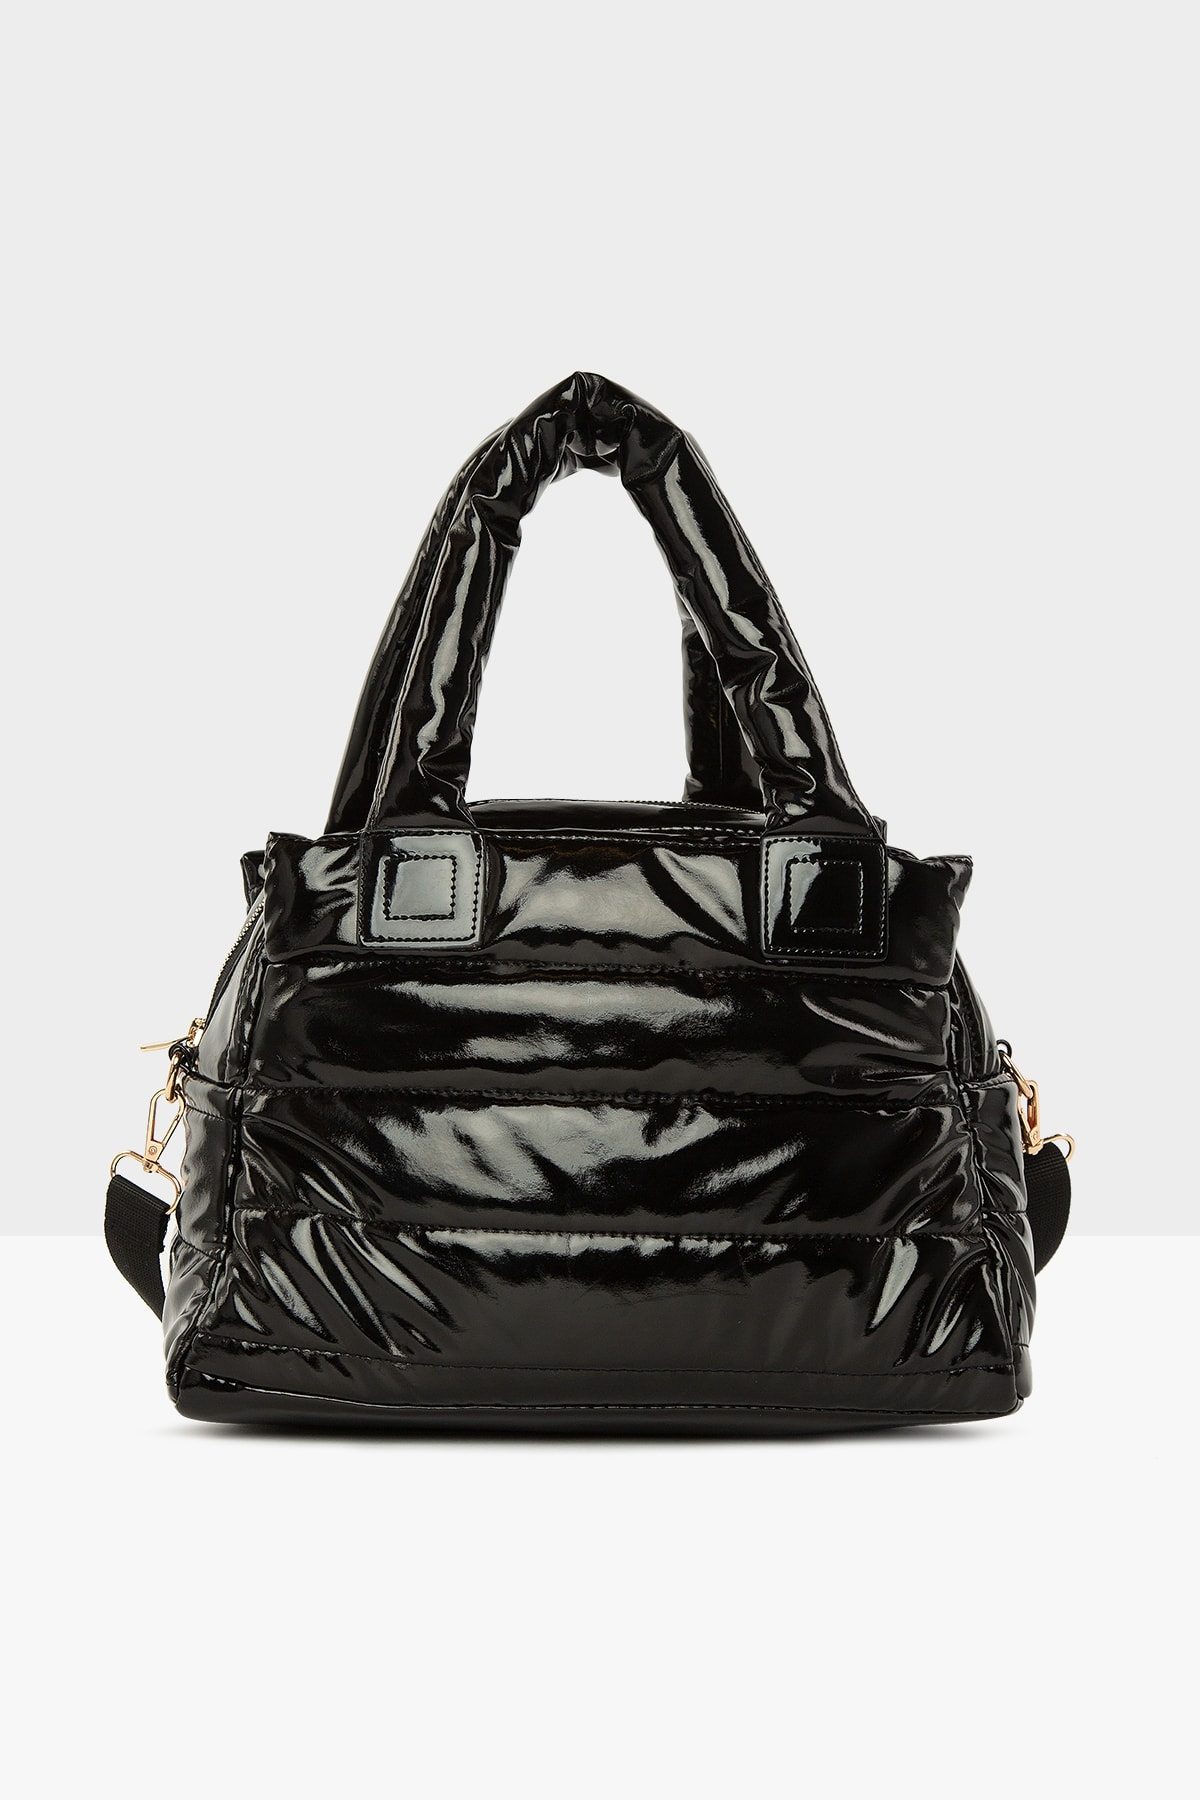 Bagmori Rugan Siyah Kadın Üç Bölmeli Şişme Çanta M000005141